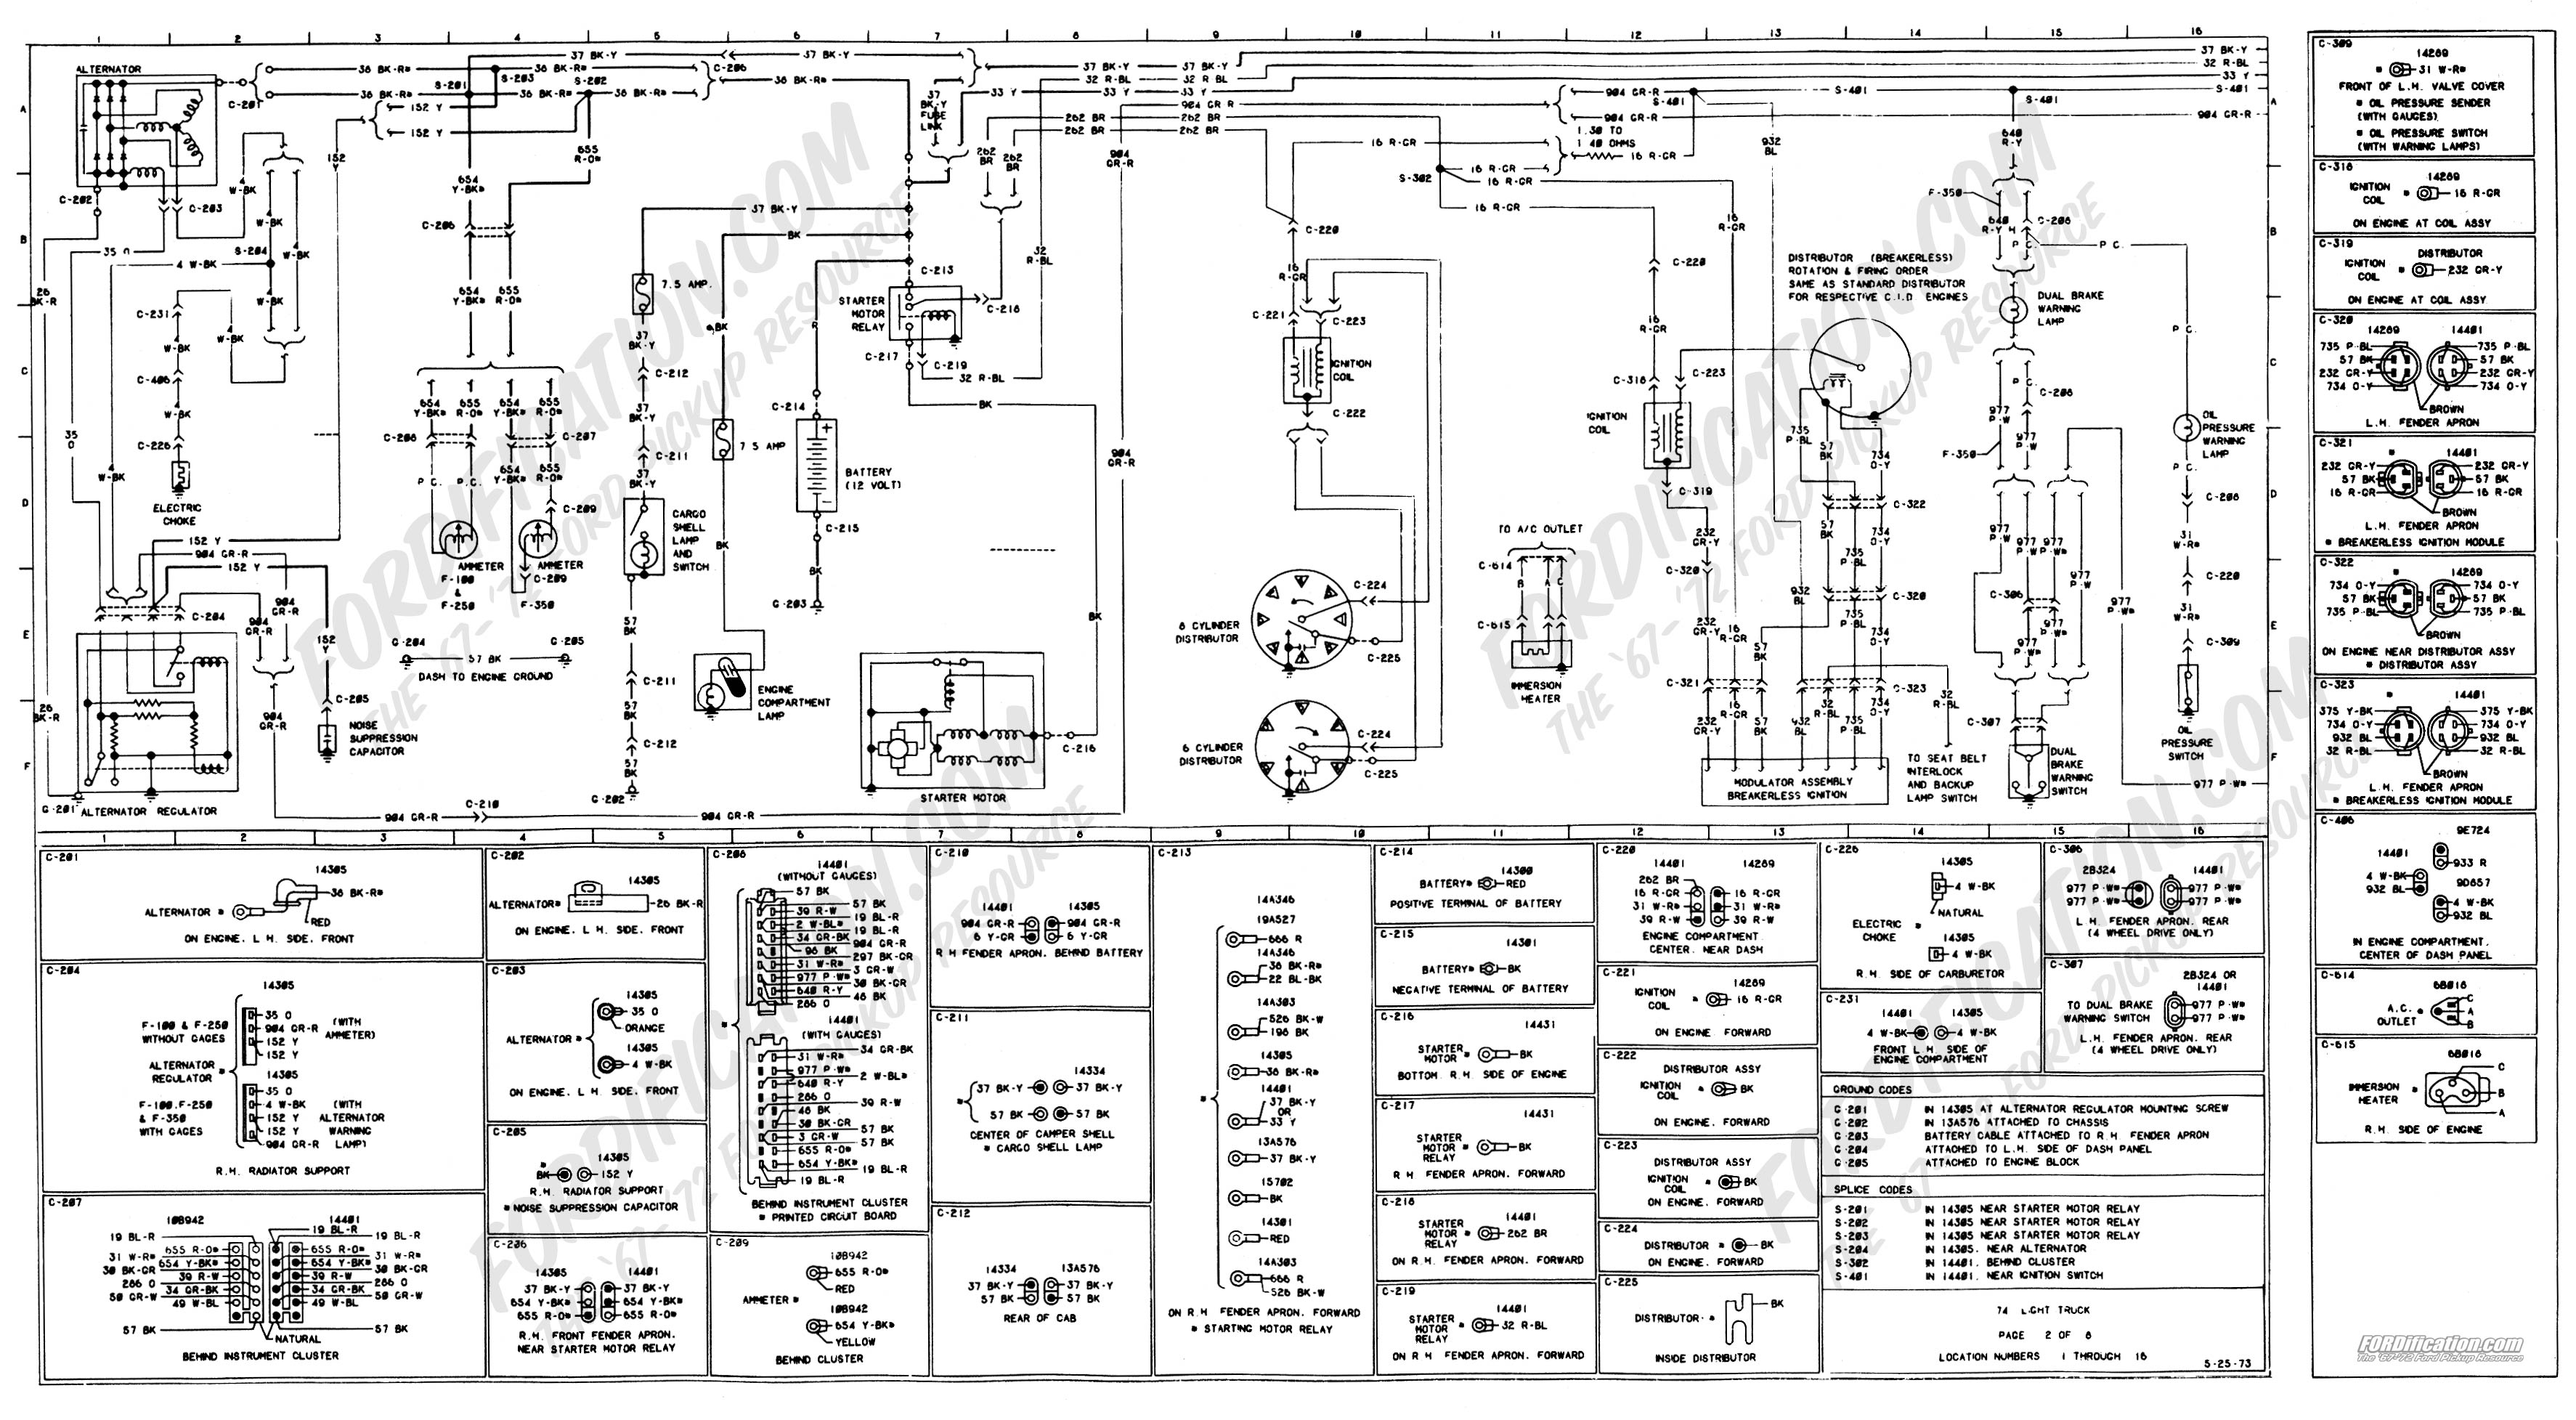 Tremendous 1978 Ford Pickup Wiring Diagram Wiring Diagram Libraries Wiring Cloud Domeilariaidewilluminateatxorg